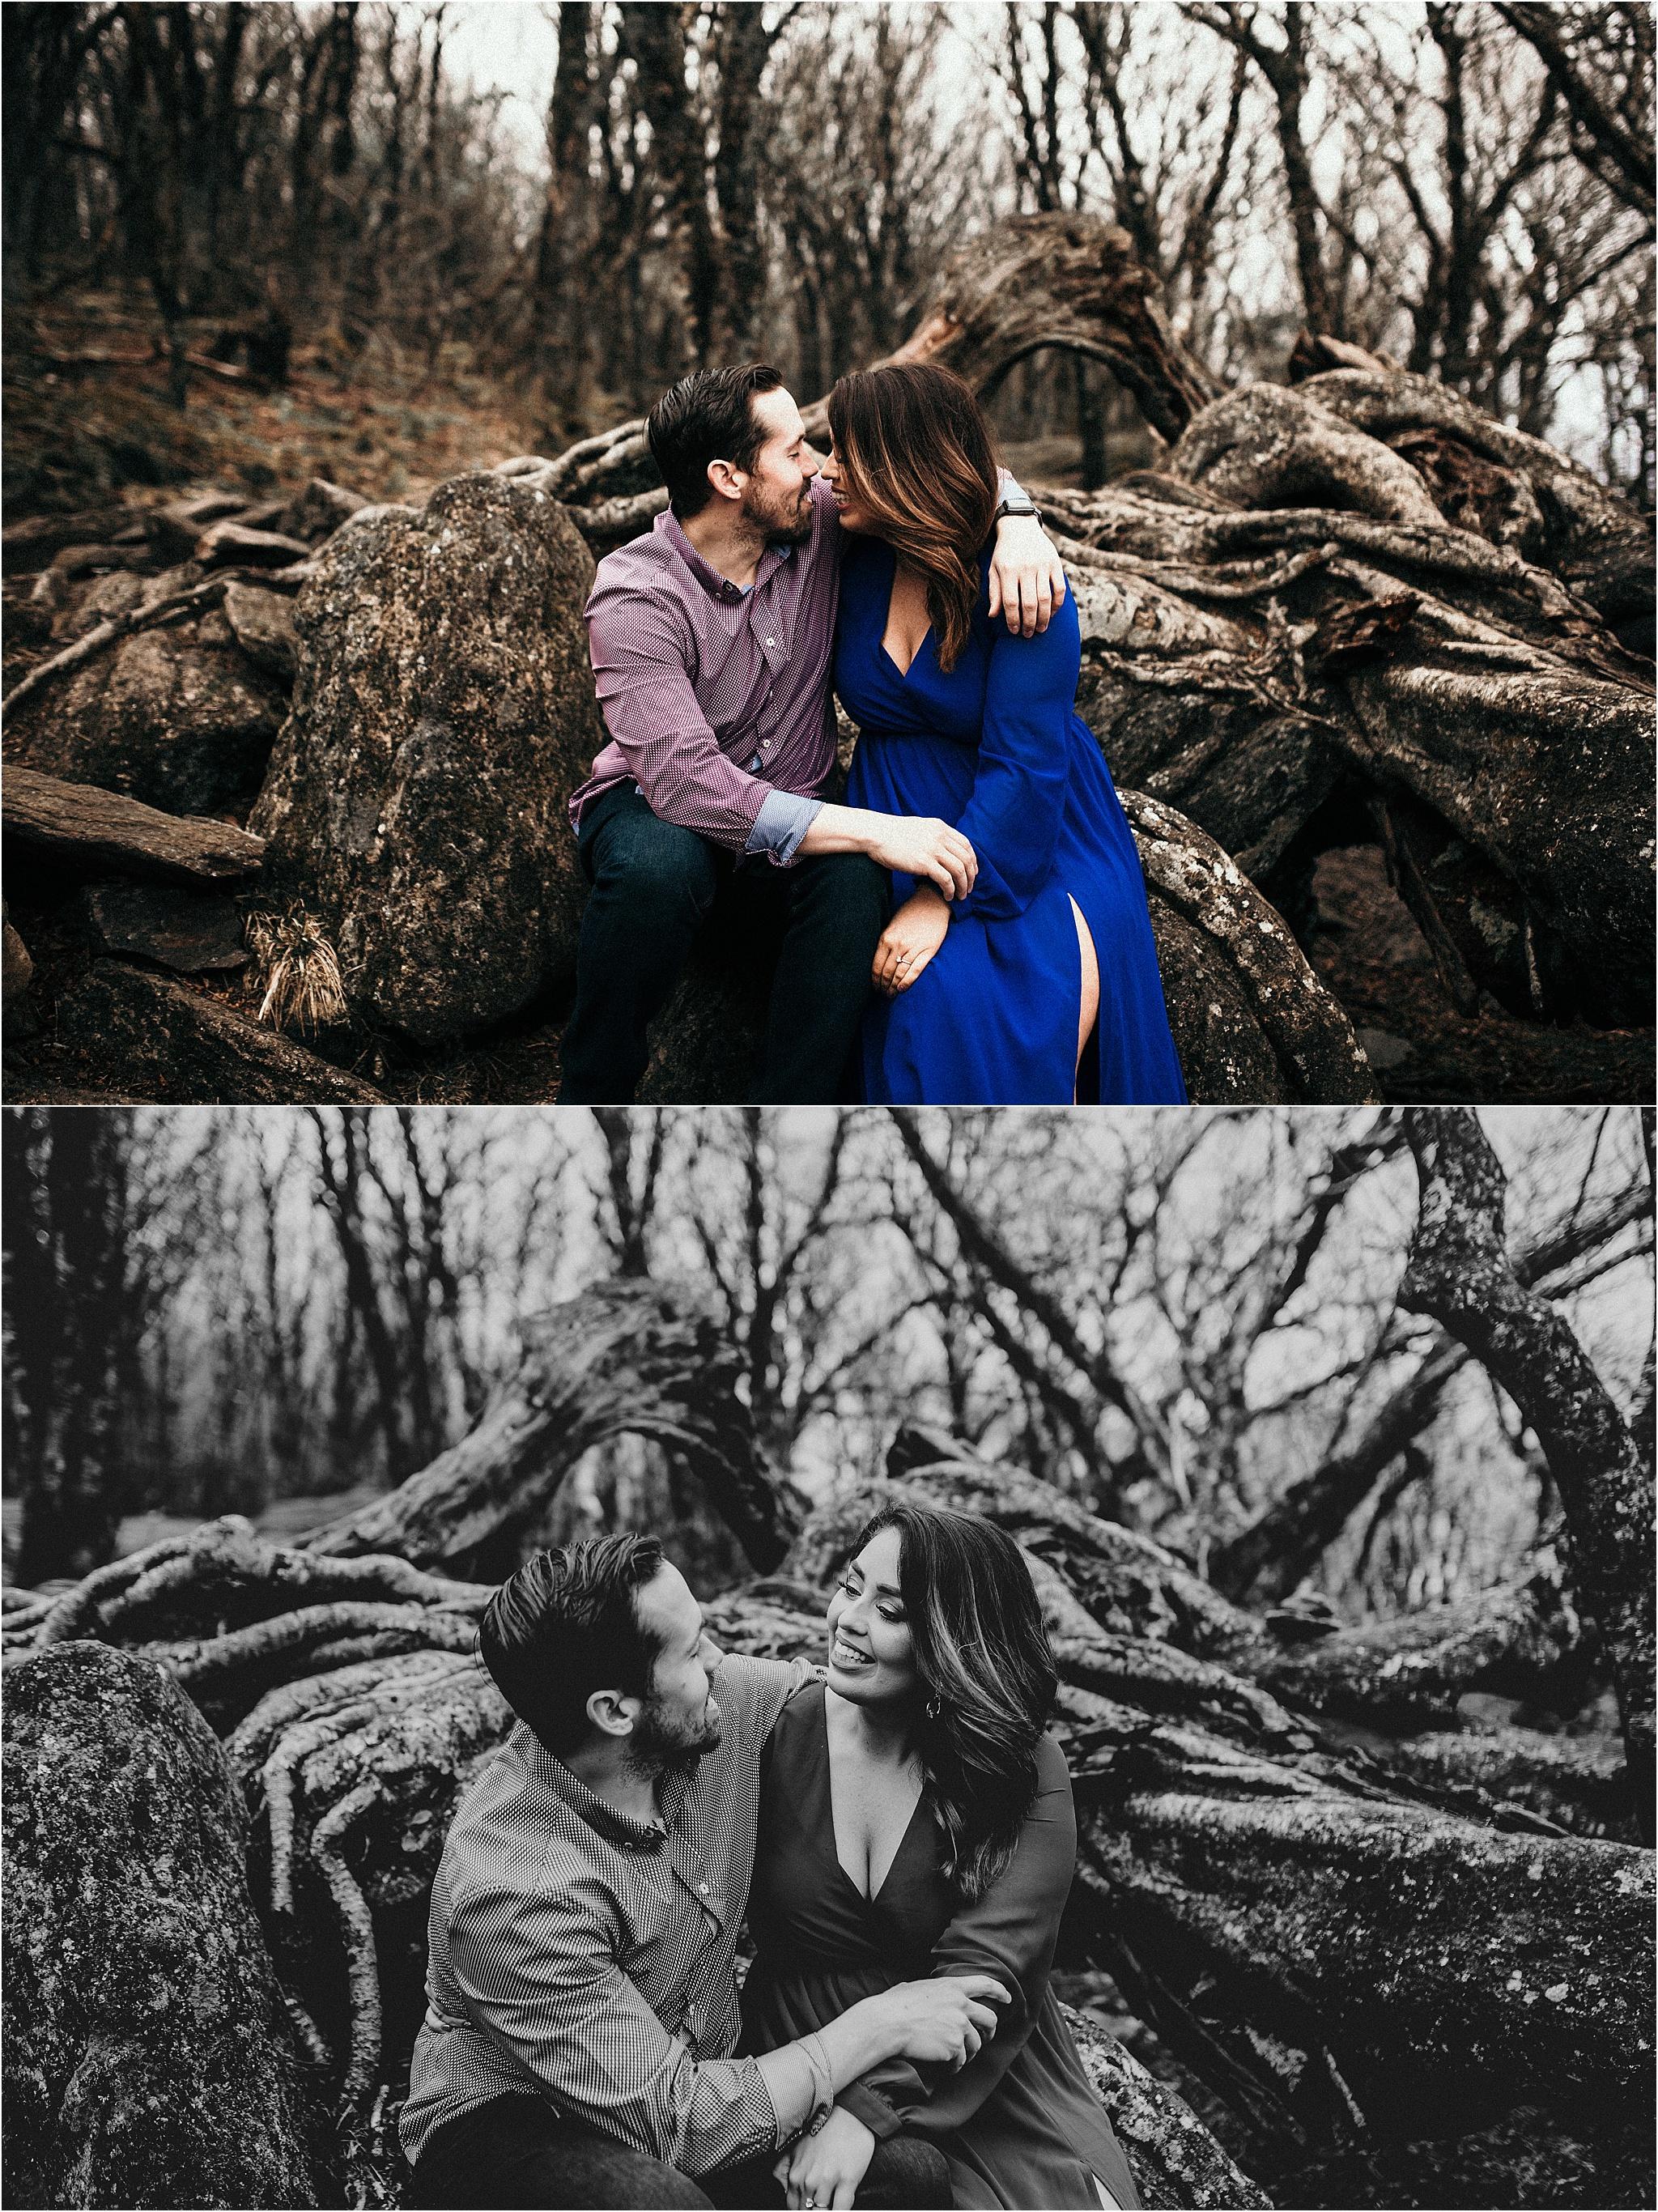 Craggy-Gardens-enagement-avonne-photography-5.jpg